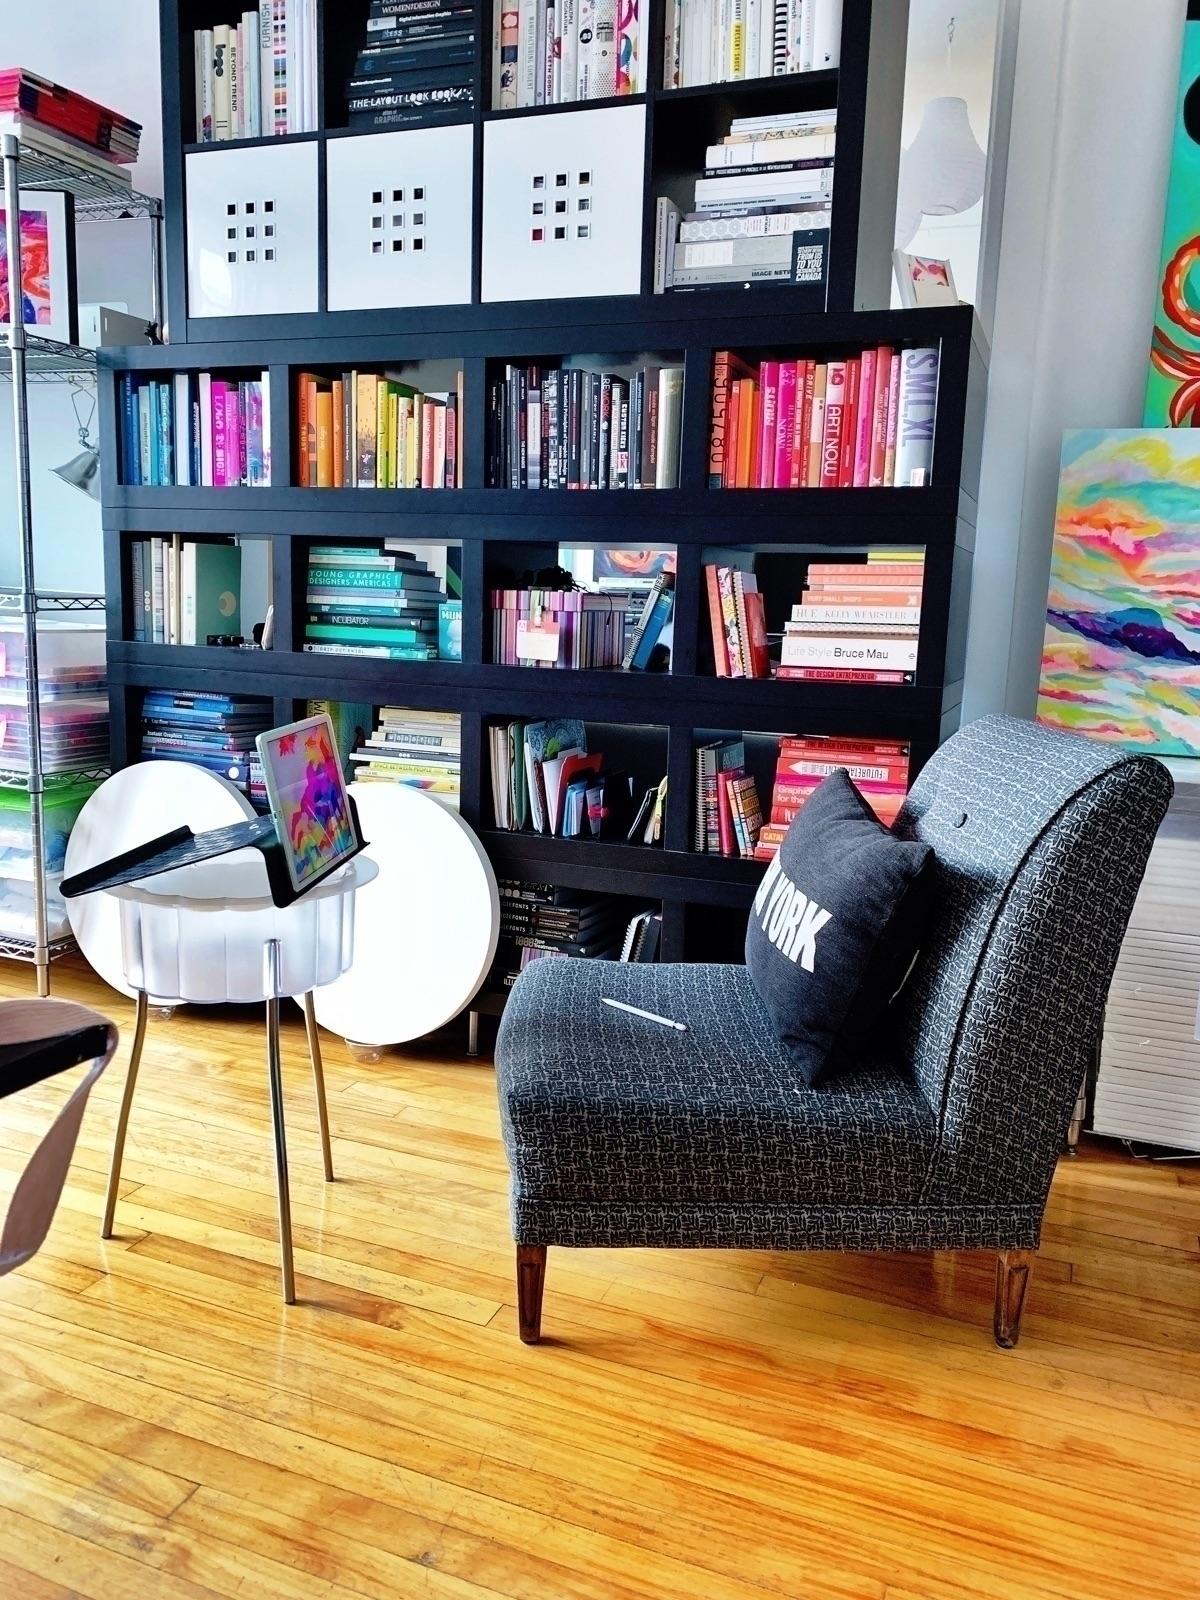 _ makeshift office_ office! cha - cgwarex | ello